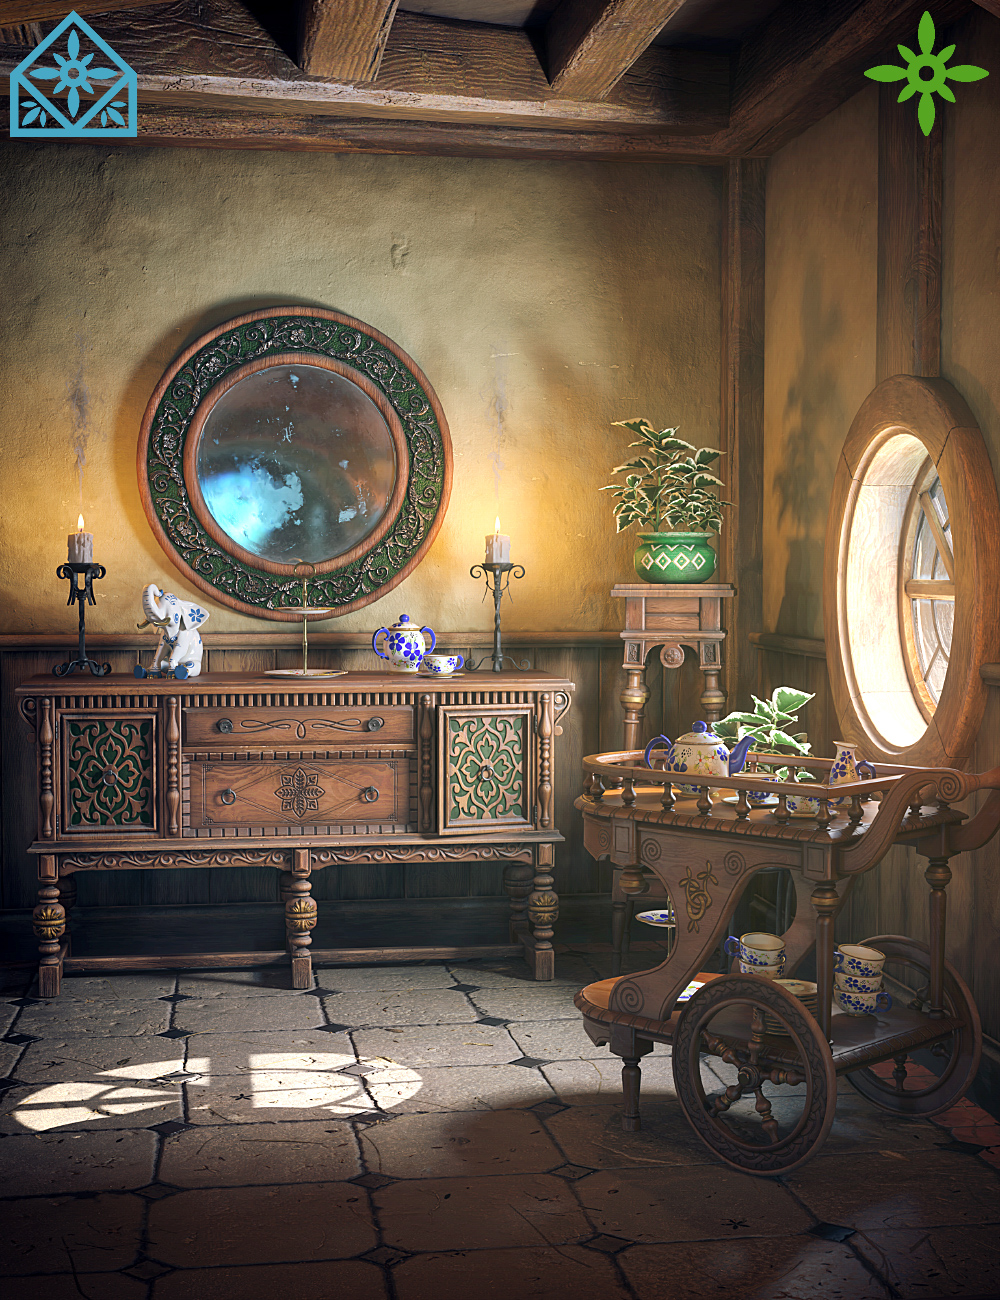 ROG Fantasy Home - Hallway Furniture Set by: StrangefateRoguey, 3D Models by Daz 3D